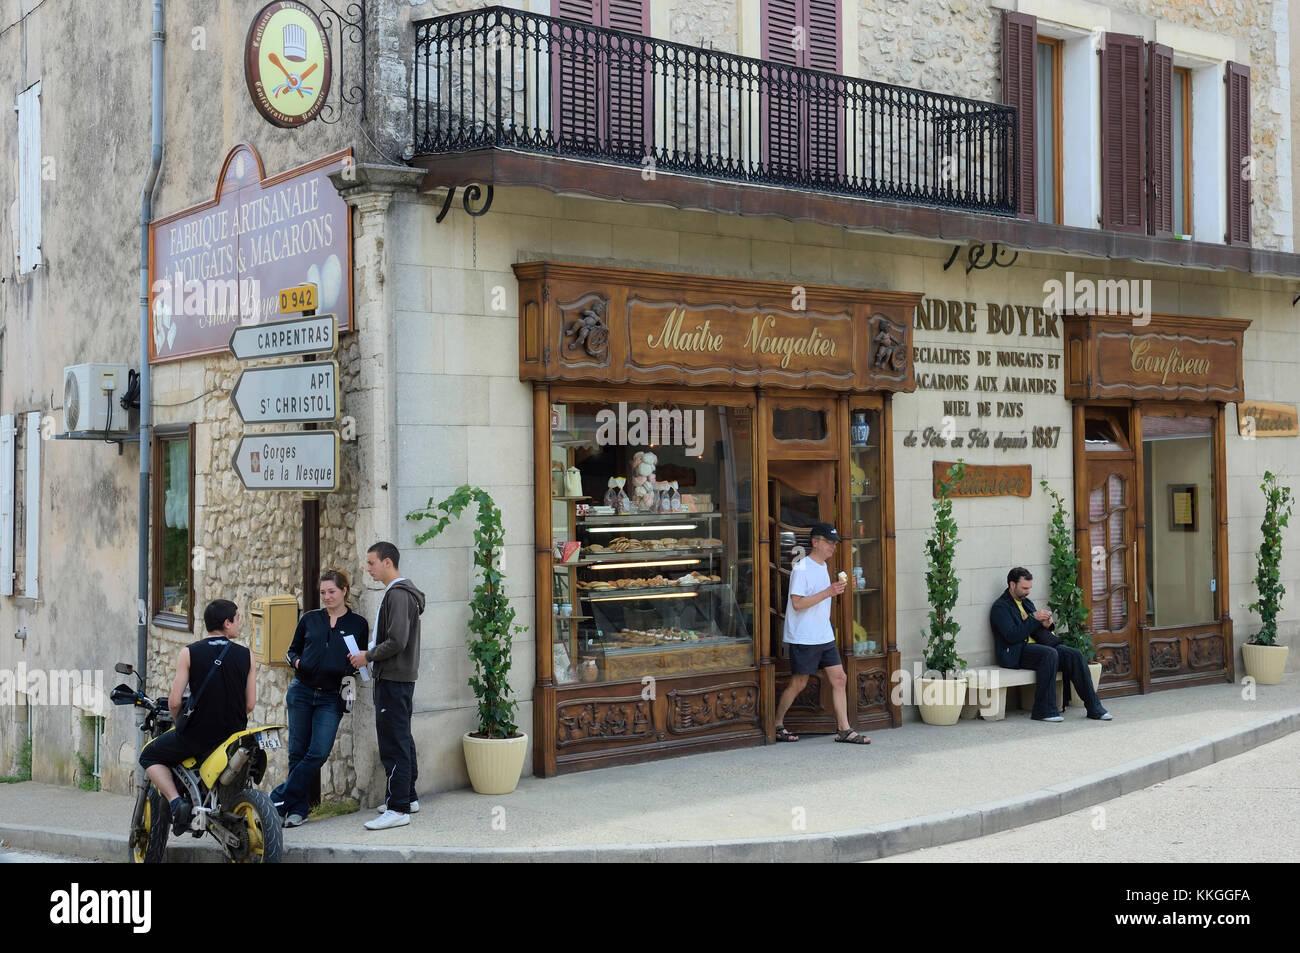 892cbbdbfa9938 Shop Provence Alpes Côte Stockfotos & Shop Provence Alpes Côte ...